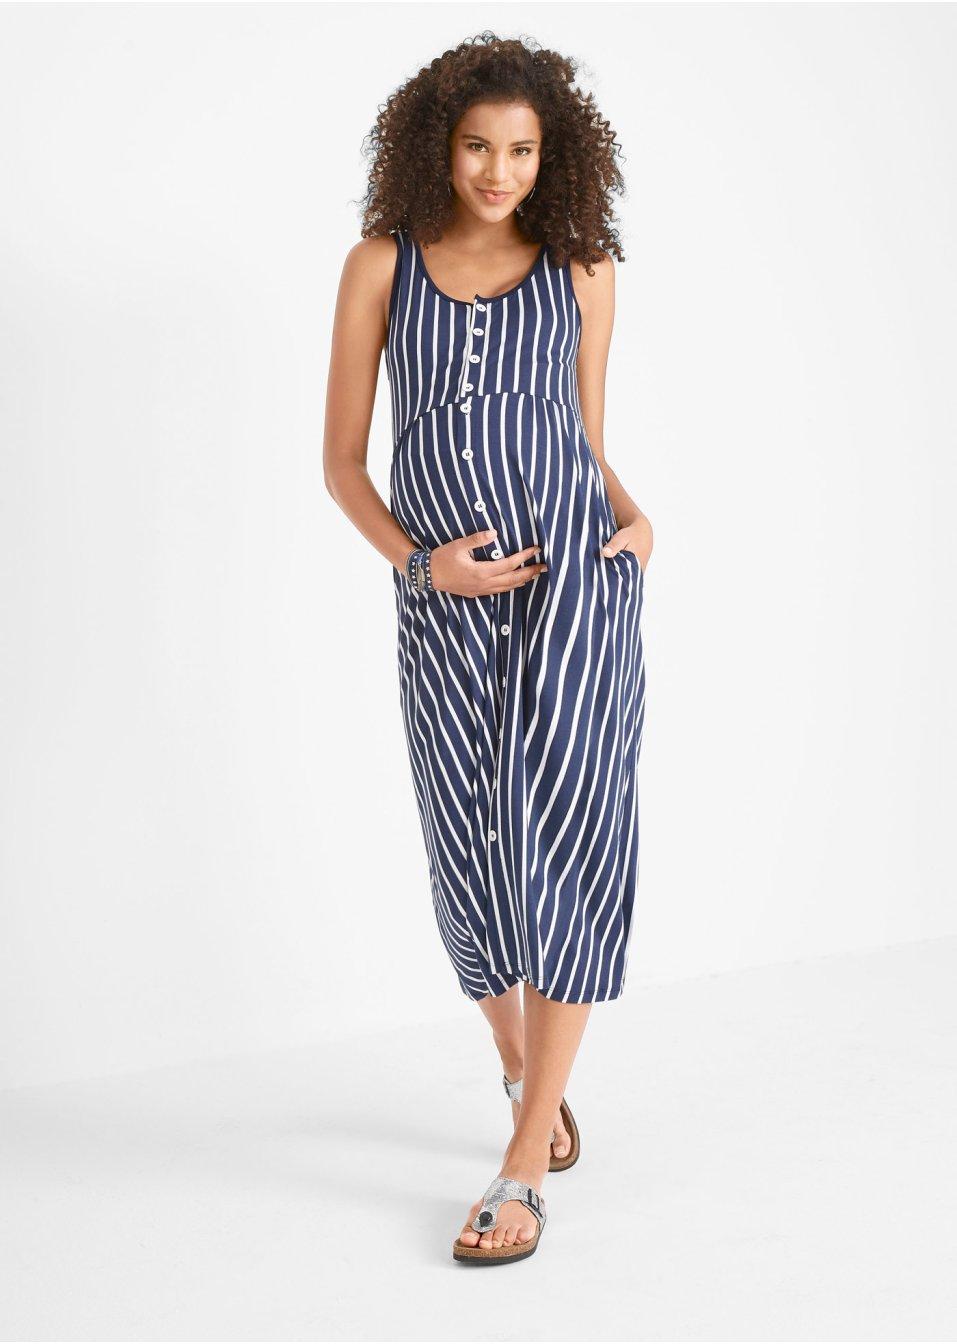 Jersey-Stillkleid / Jersey-Umstandskleid, gestreift